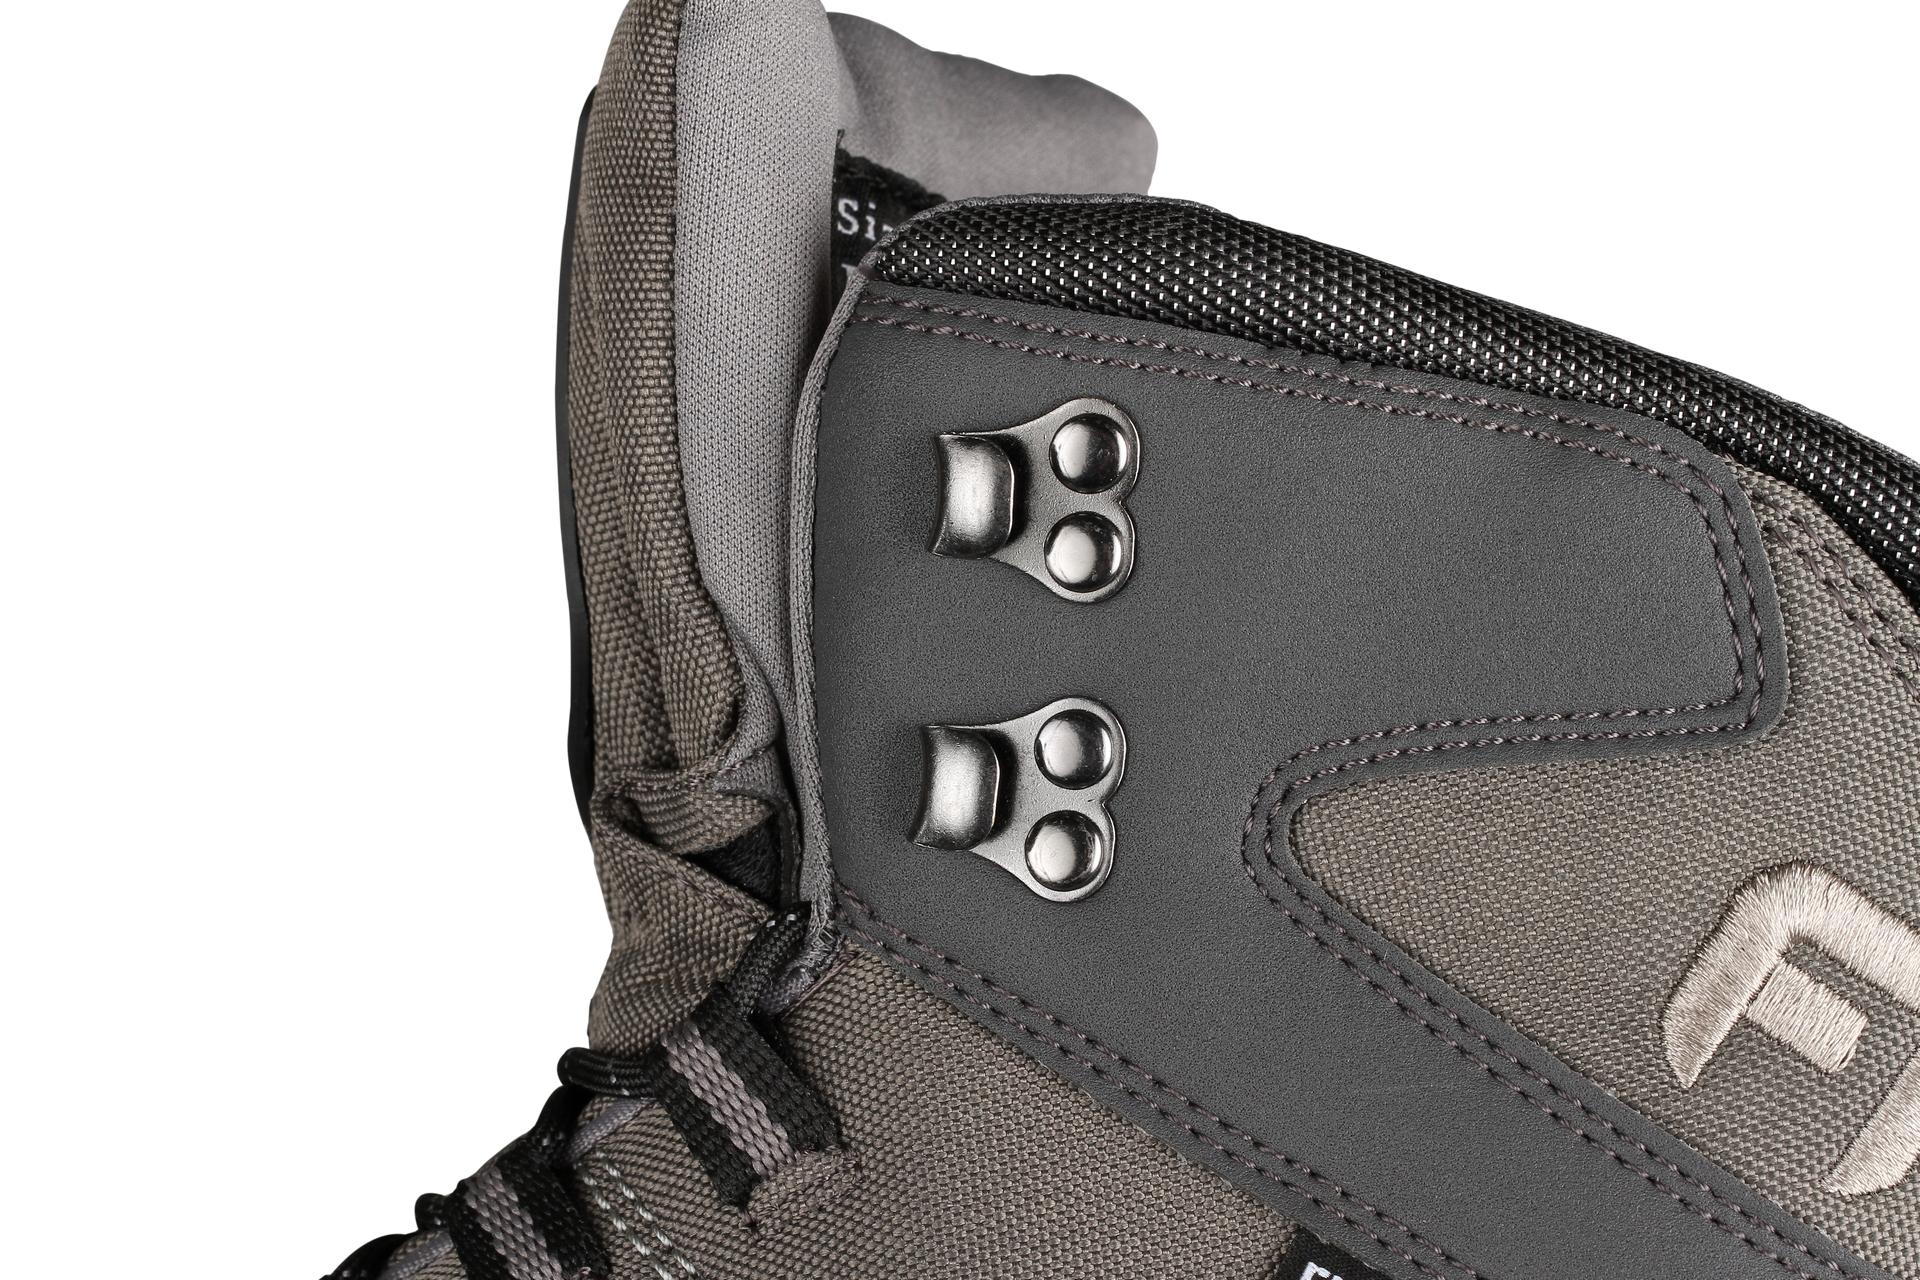 Забродные ботинки Finntrail NEW STALKER 5192 LIGHT GREY  Артмото - купить квадроцикл в украине и харькове, мотоцикл, снегоход, скутер, мопед, электромобиль